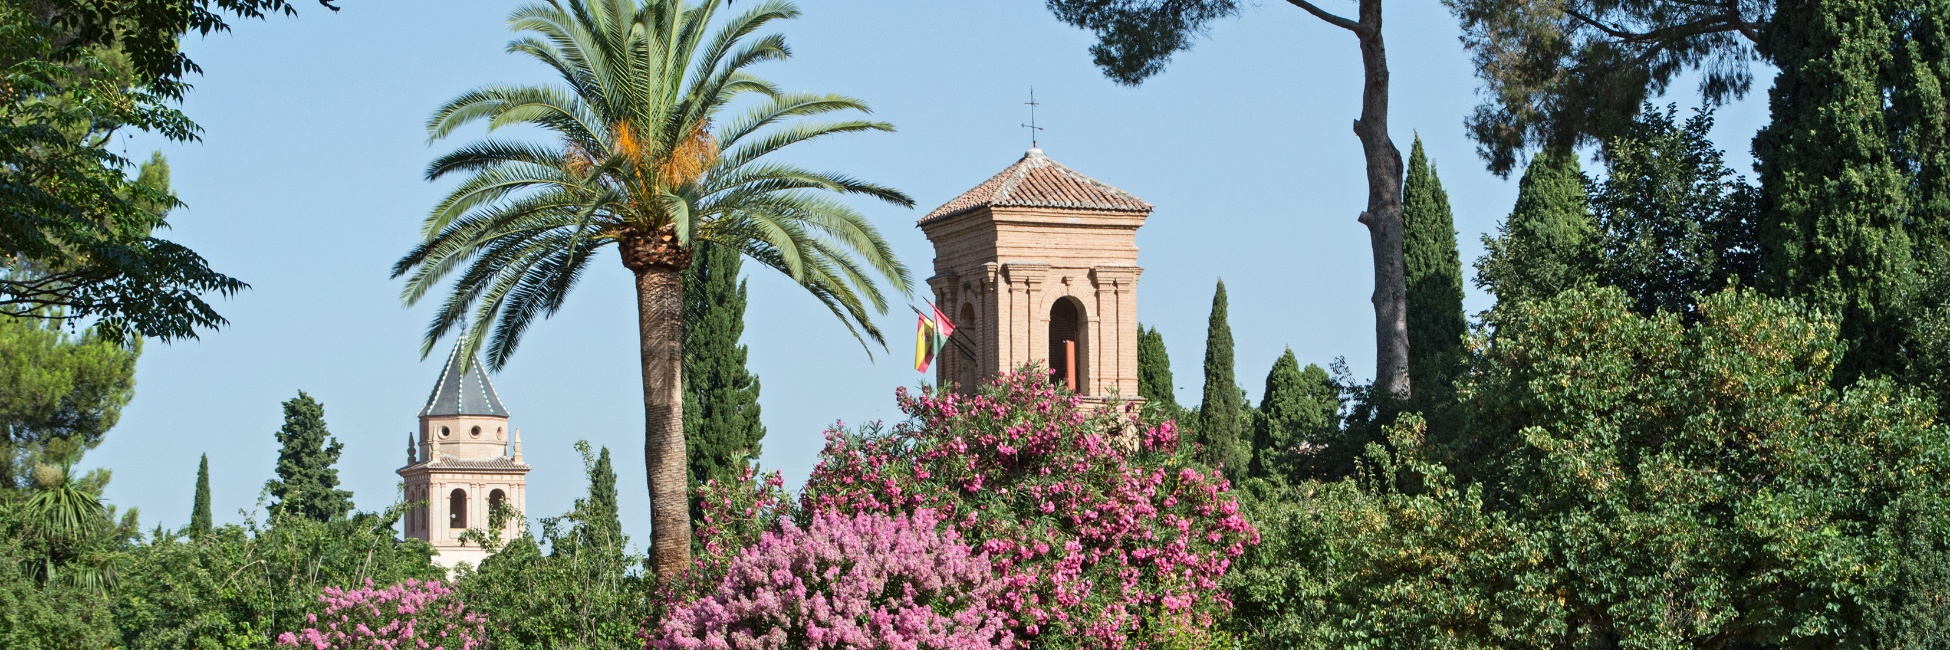 Alhambra en Espagne